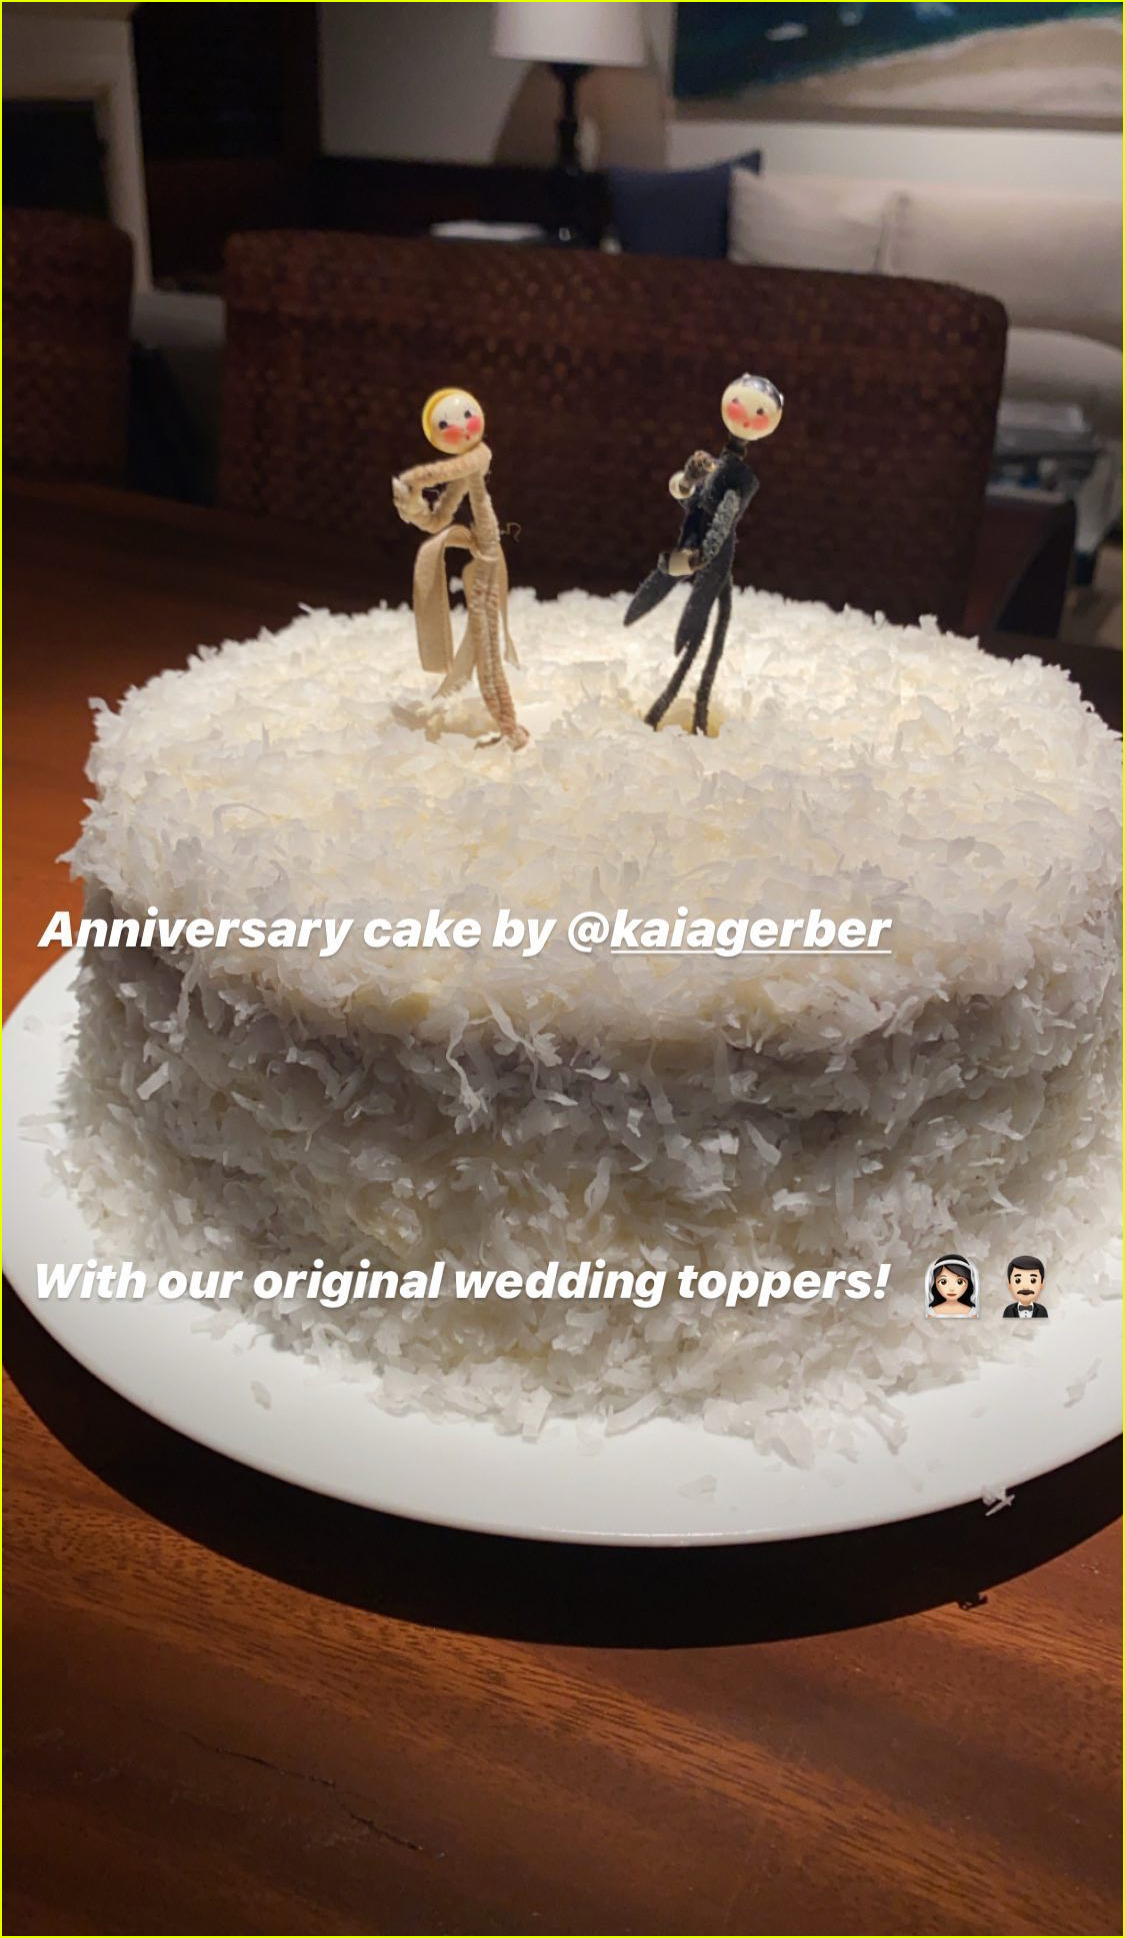 cindy crawford rande gerber celebrate 22nd wedding anniversary4461405